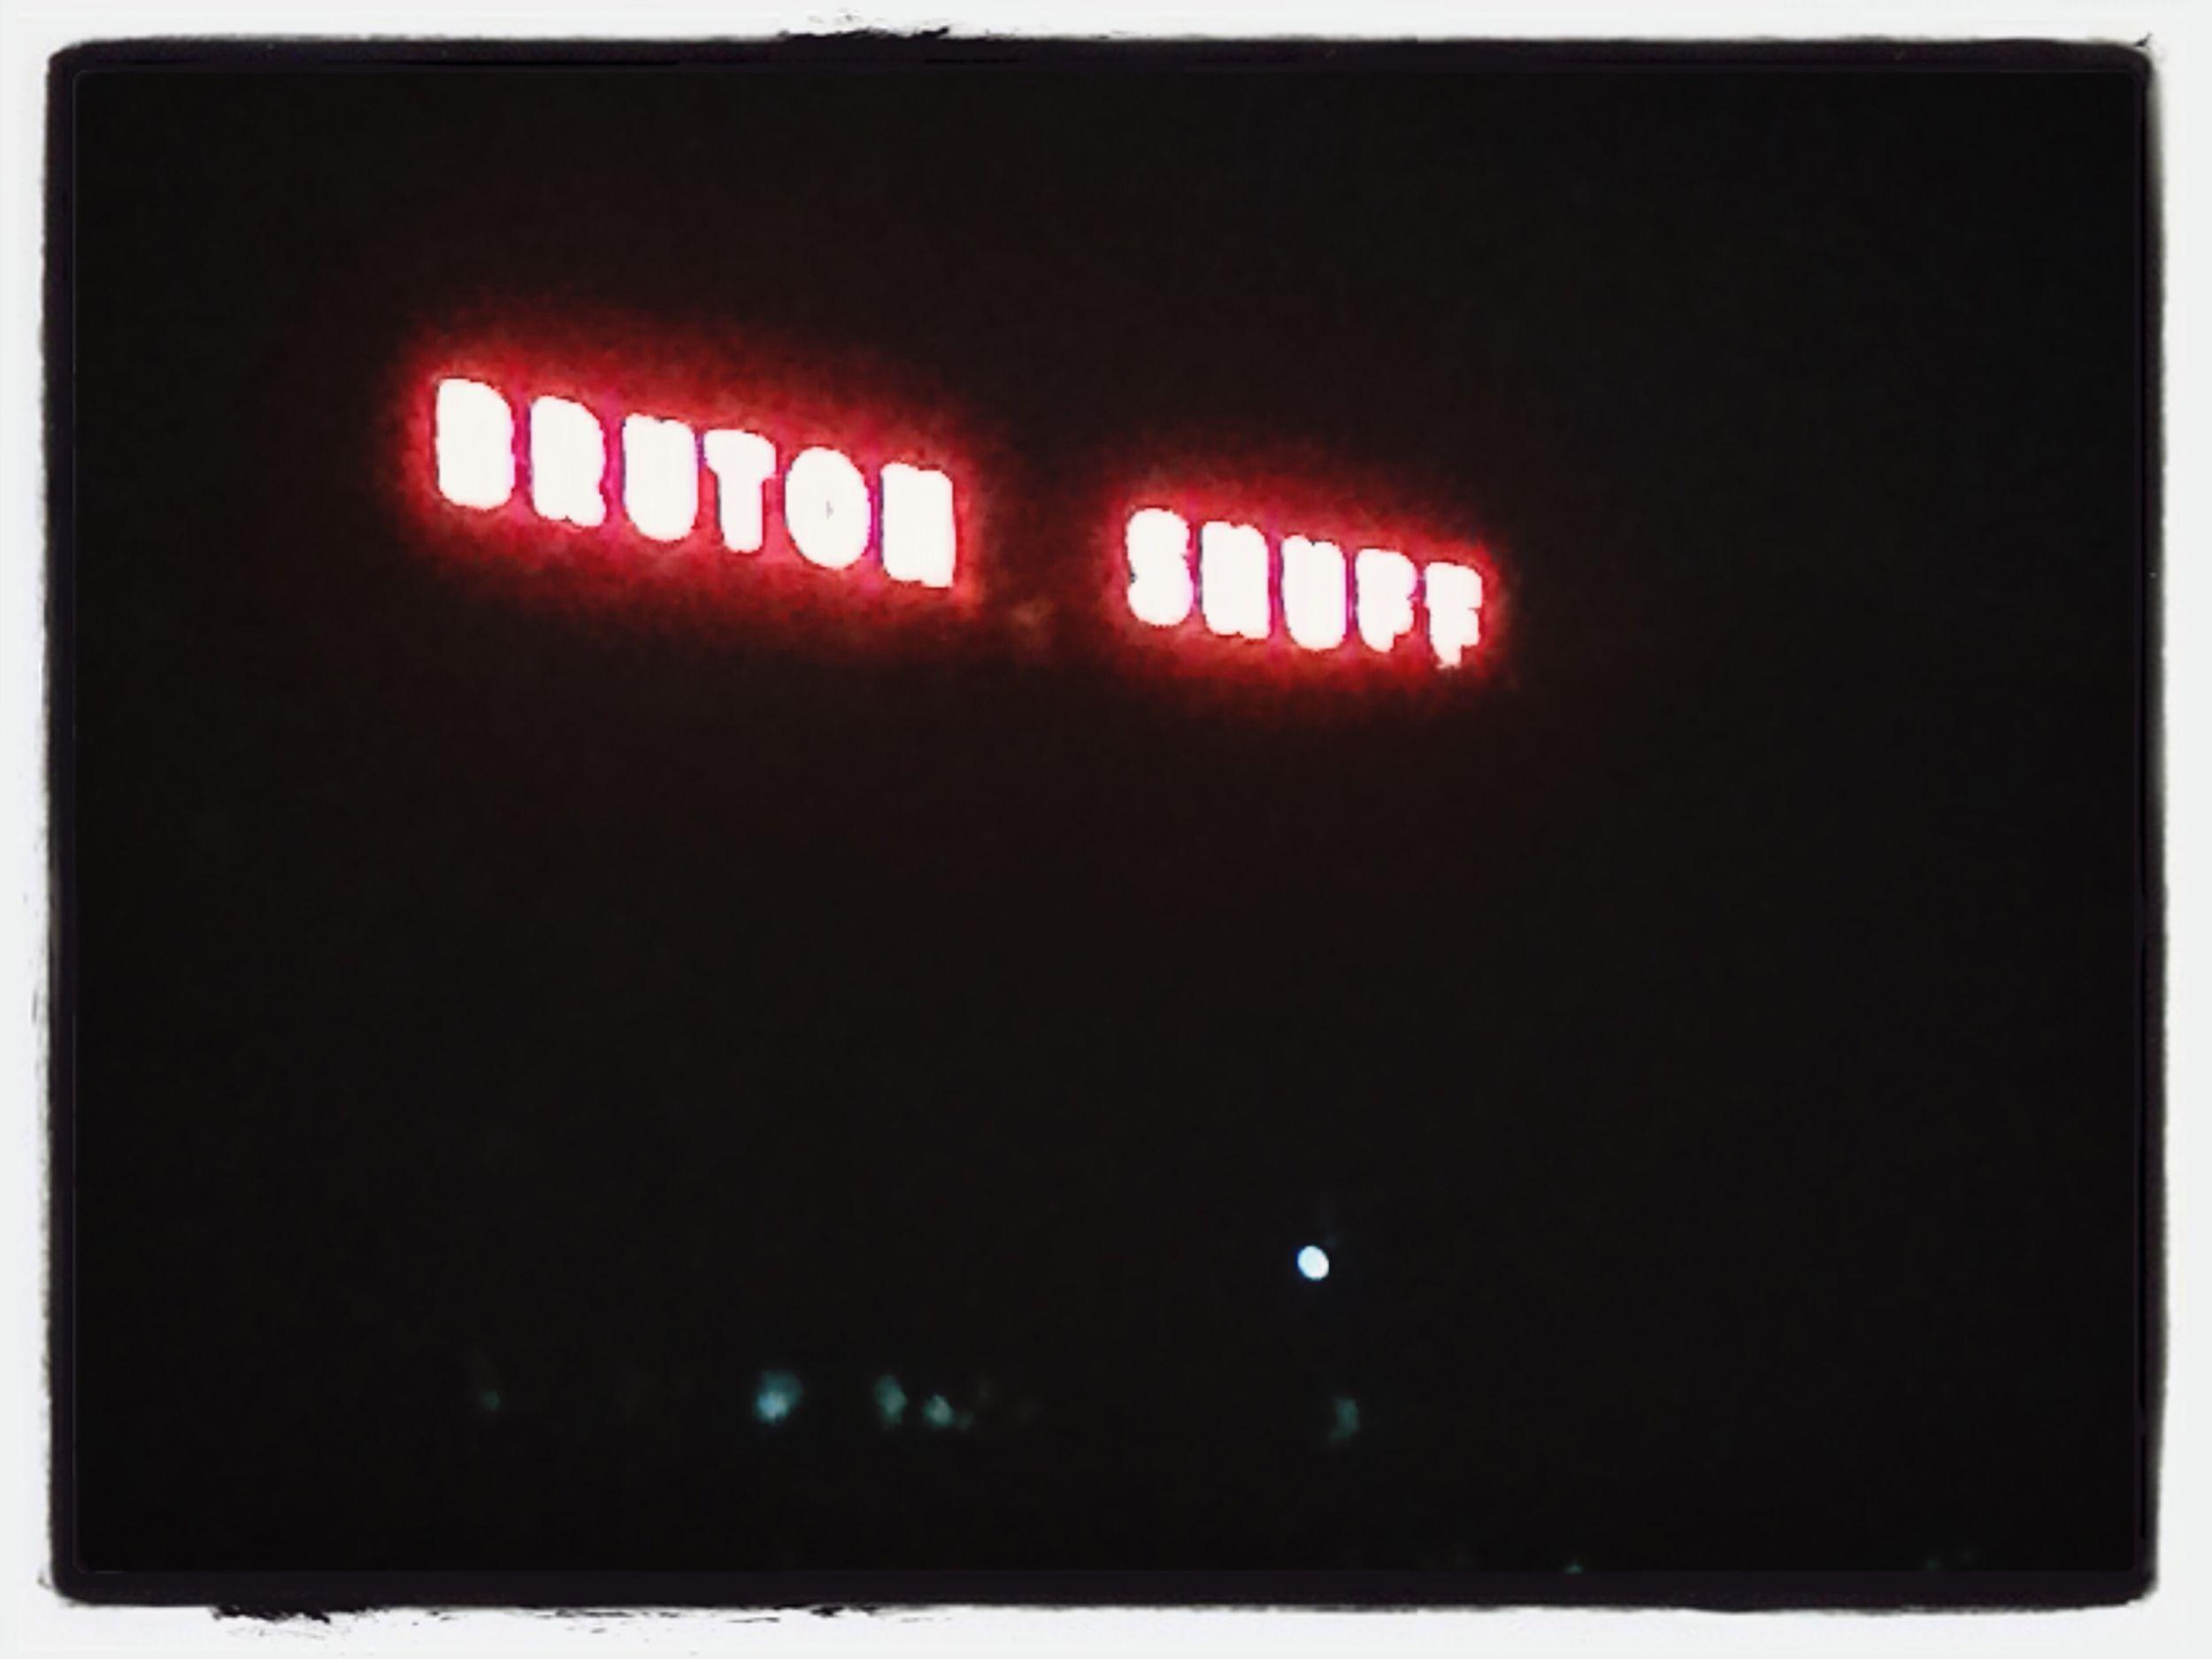 Bruton Snuff Random Sign